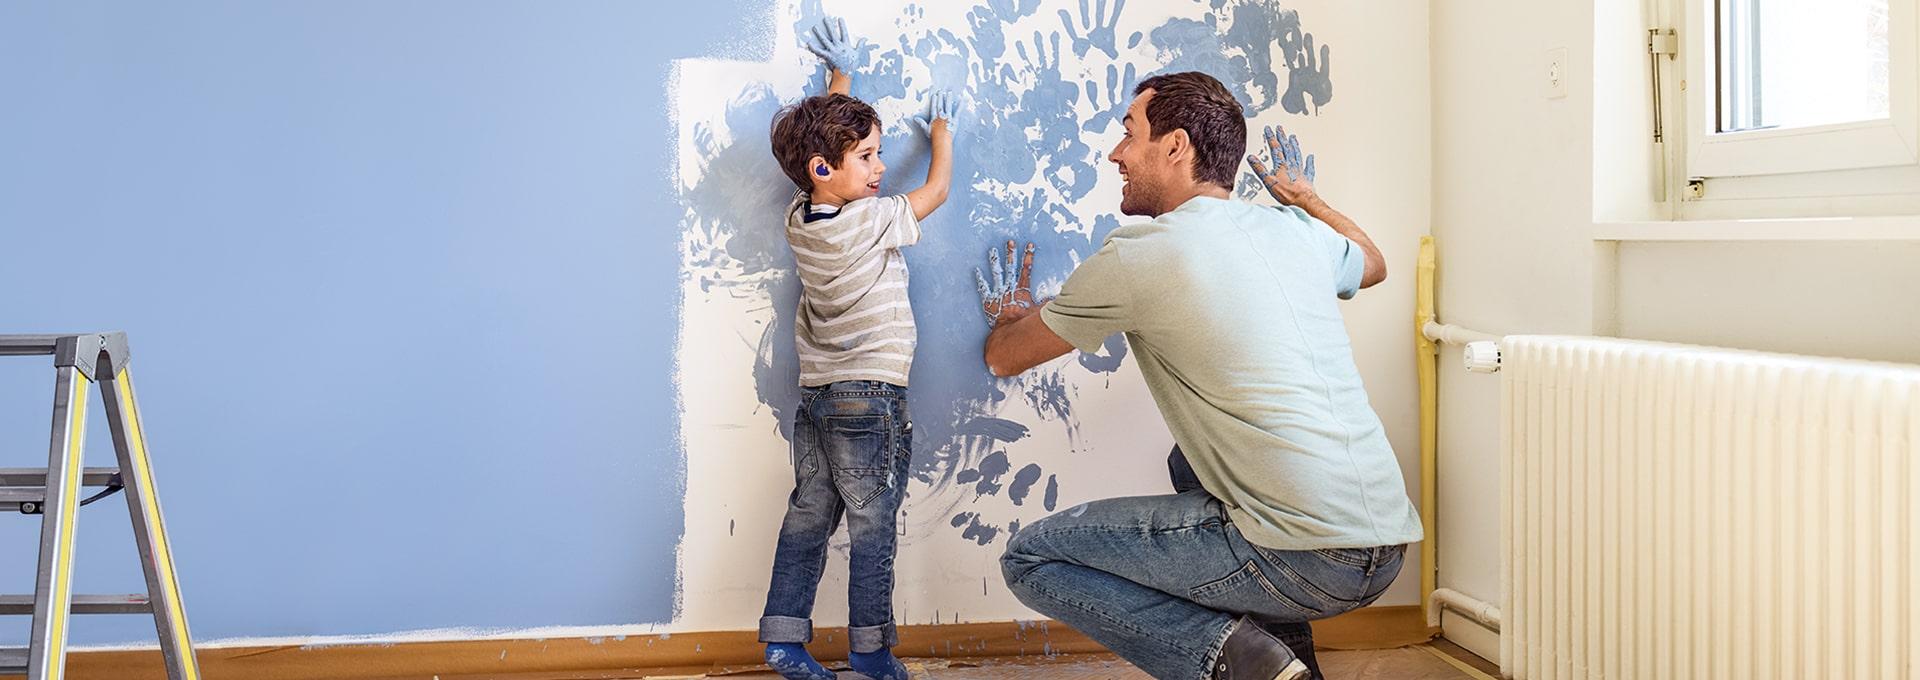 Отец и сын со слуховыми аппаратами  Bernafon Leox Super Power Ultra Power красят стену и спонтанно оставляют отпечатки рук на стене.